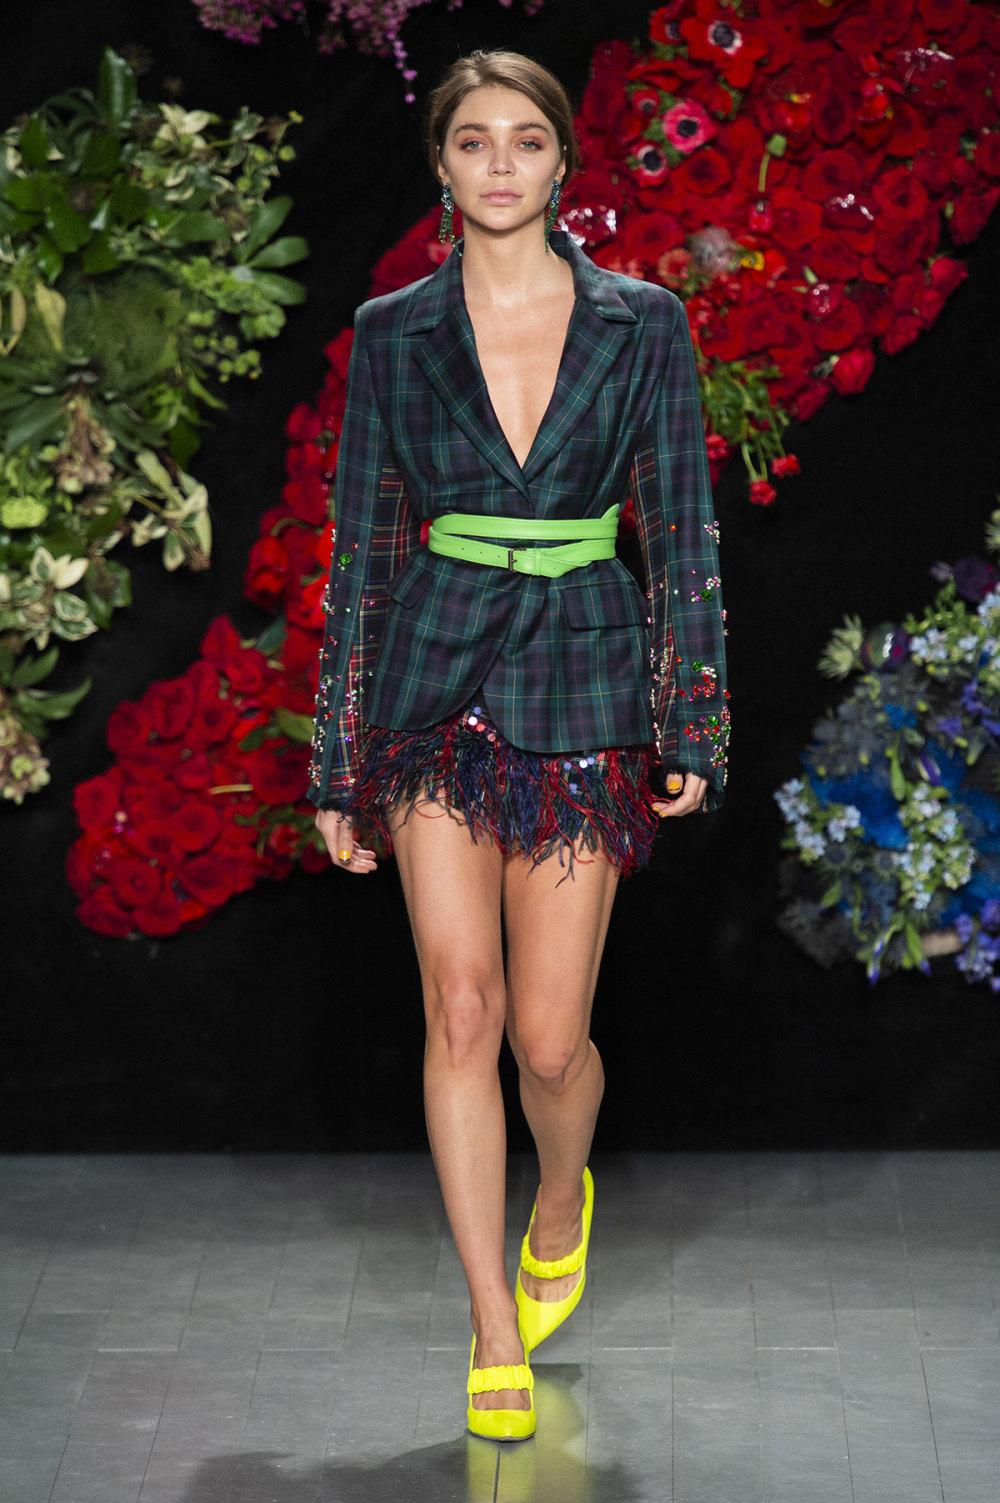 Roberta Einer时装系列格子呢西装外套收紧腰部霓虹色腰带连帽衫-6.jpg